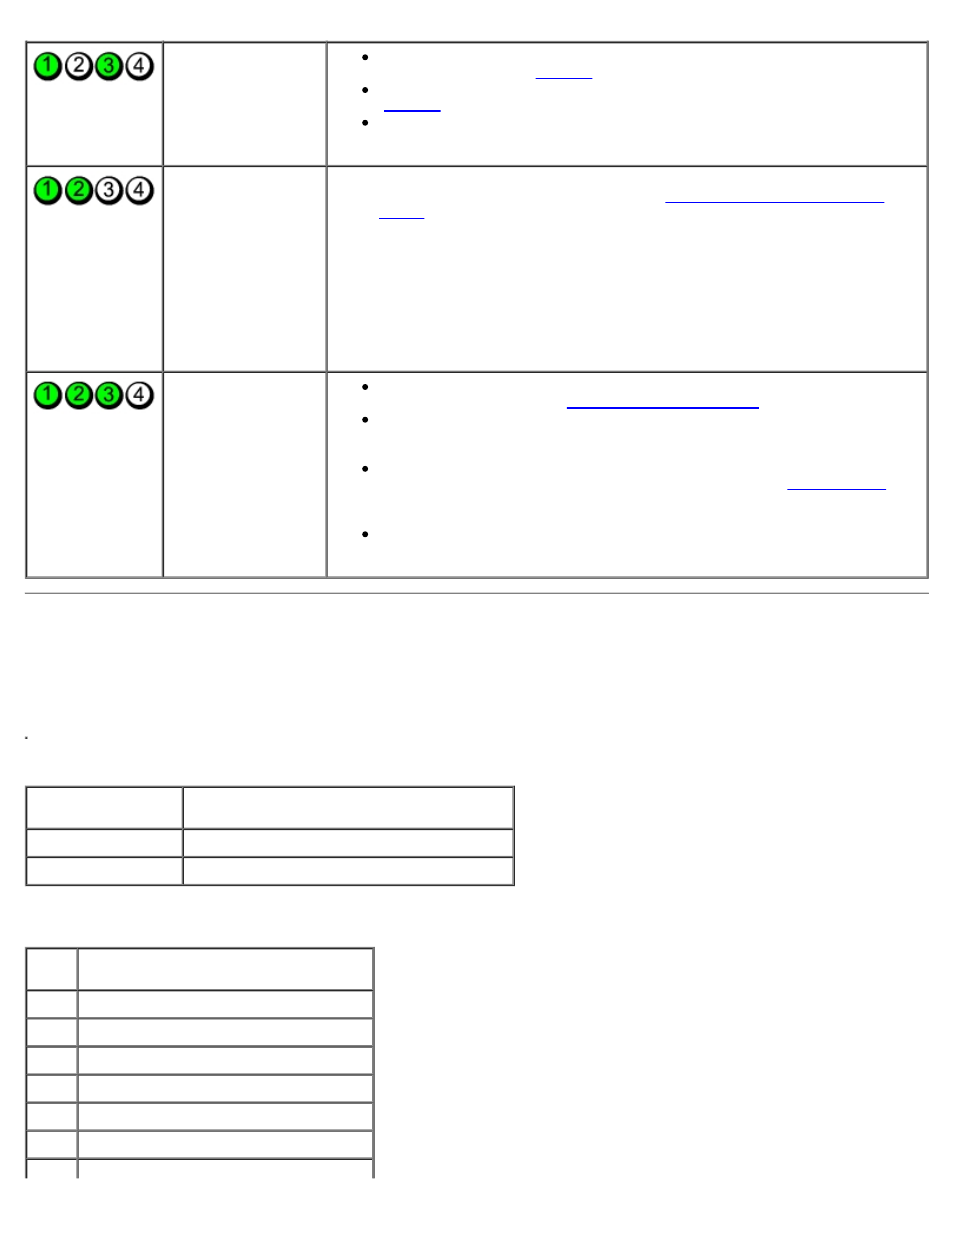 beep codes dell xps 710 user manual page 67 88 original mode rh manualsdir com Dell XPS 710 Motherboard Specs XPS 720 Motherboard Specs